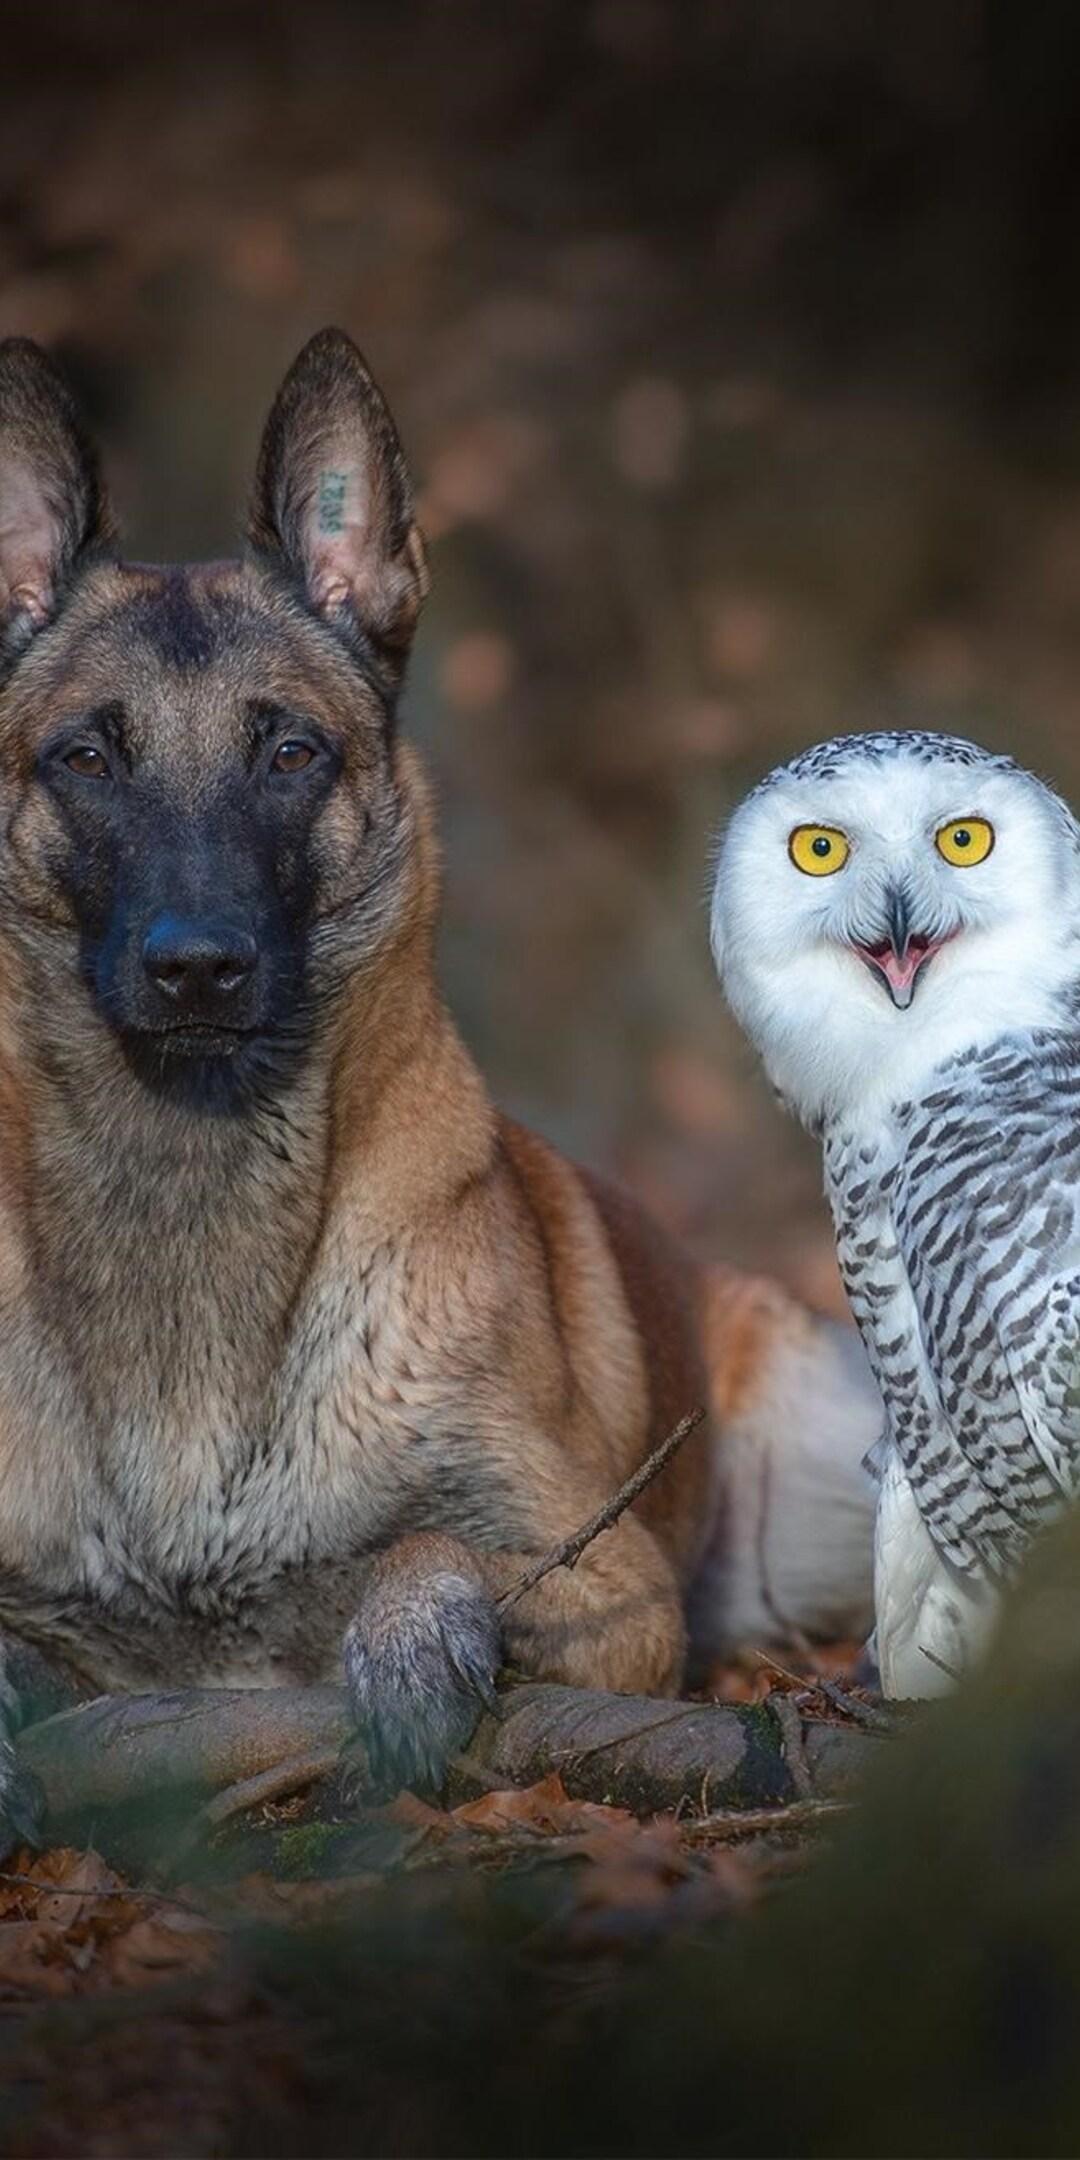 dog-with-owl.jpg